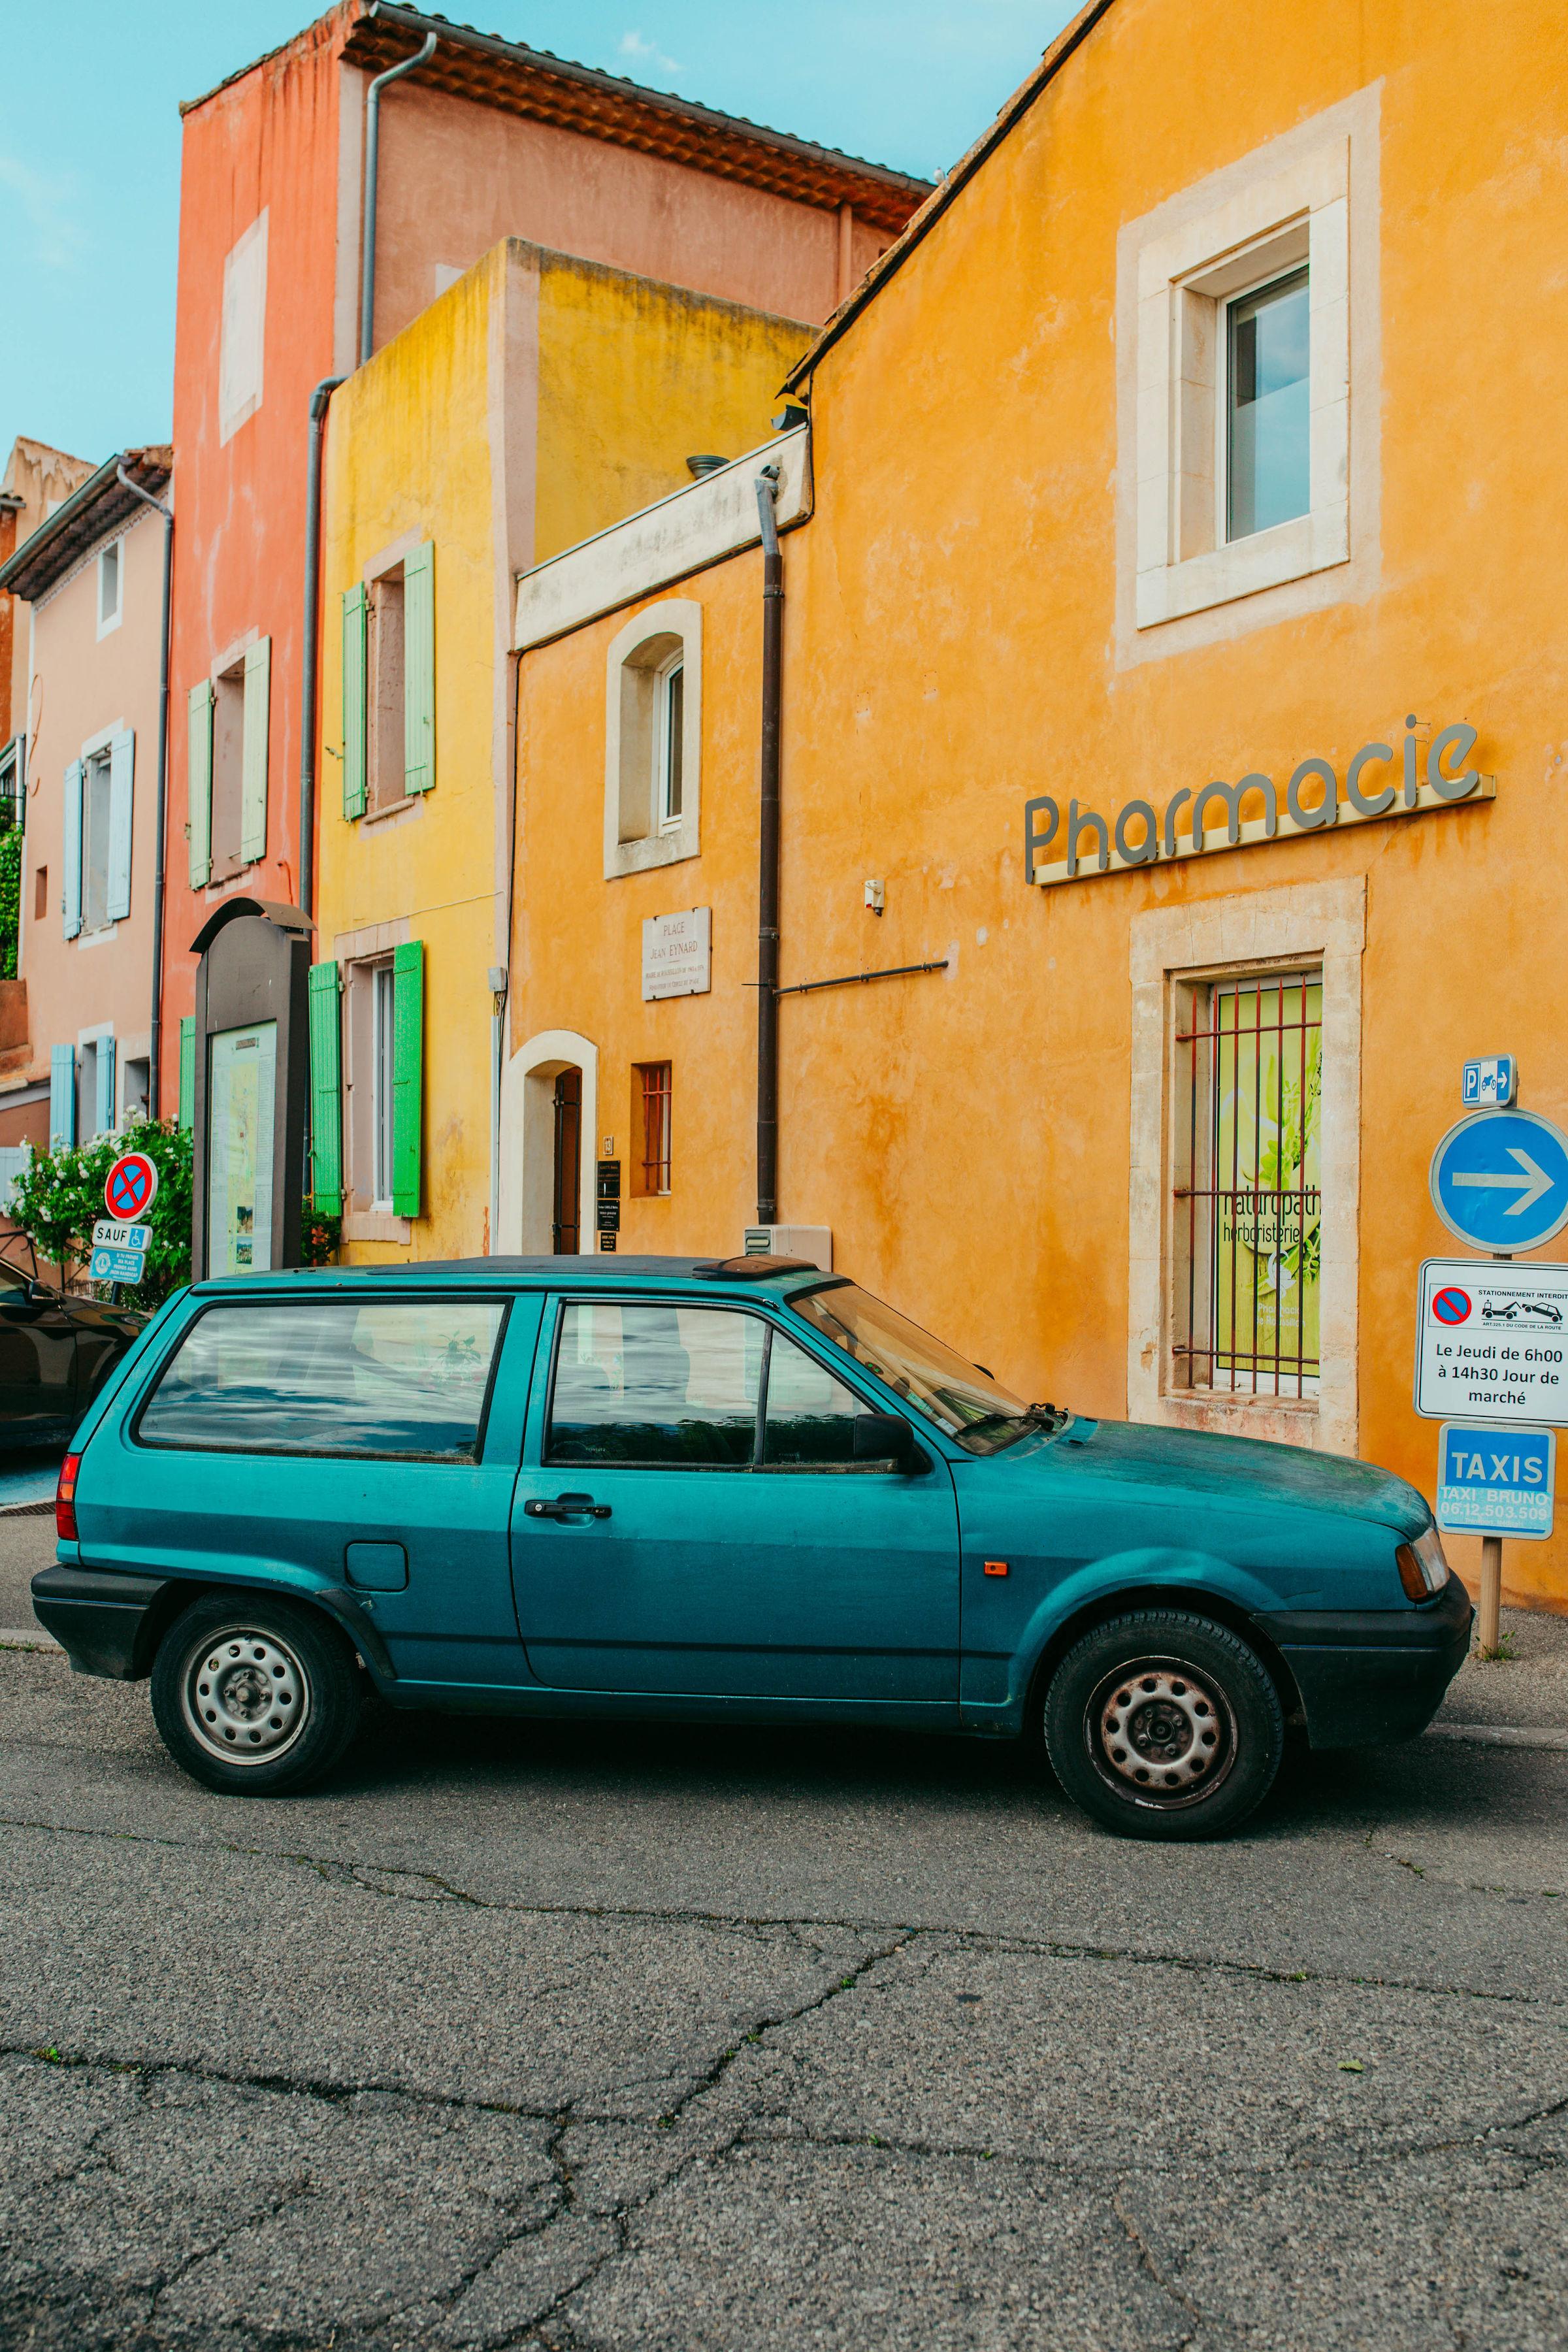 provence-7.jpg